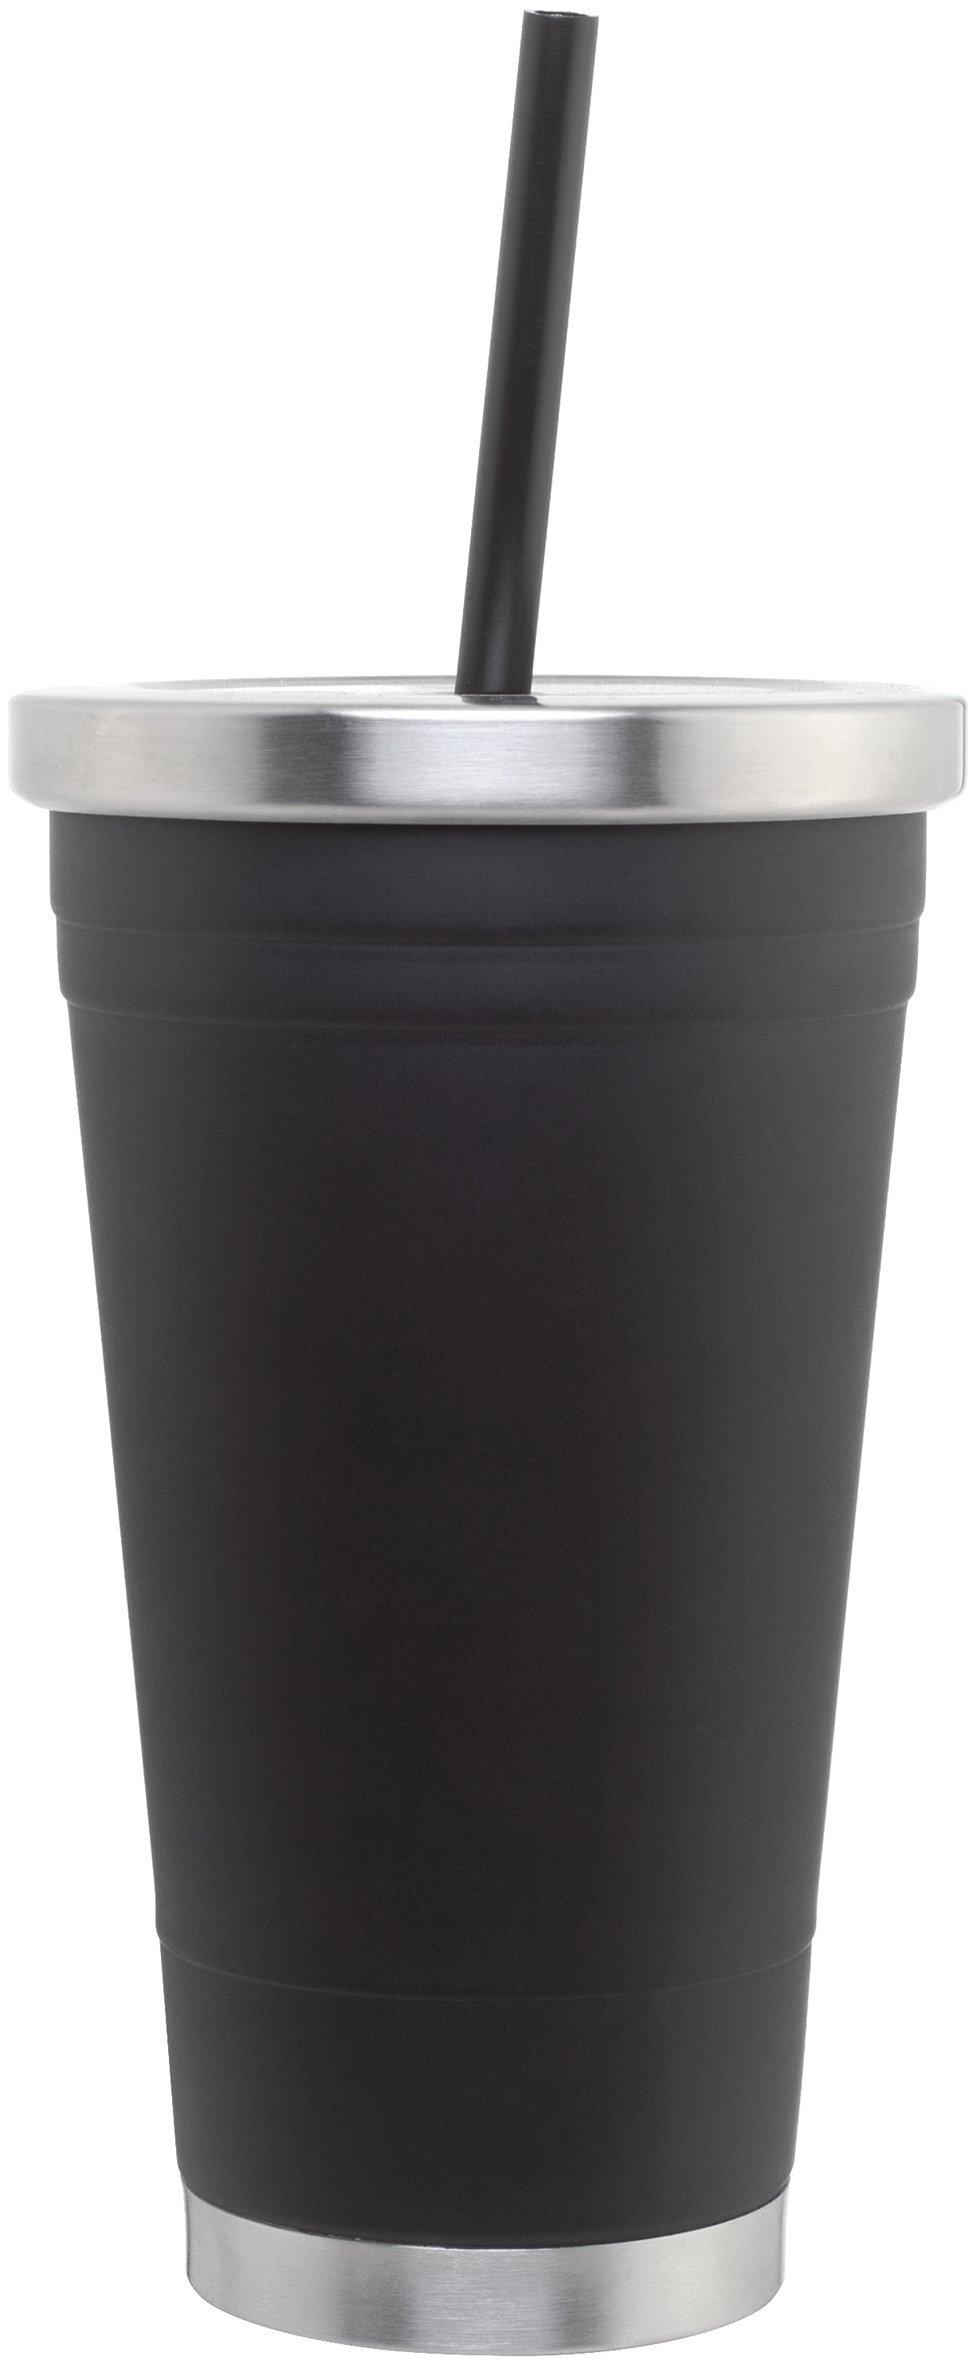 Metro Vacuum Tumbler, 18oz., BPA Free